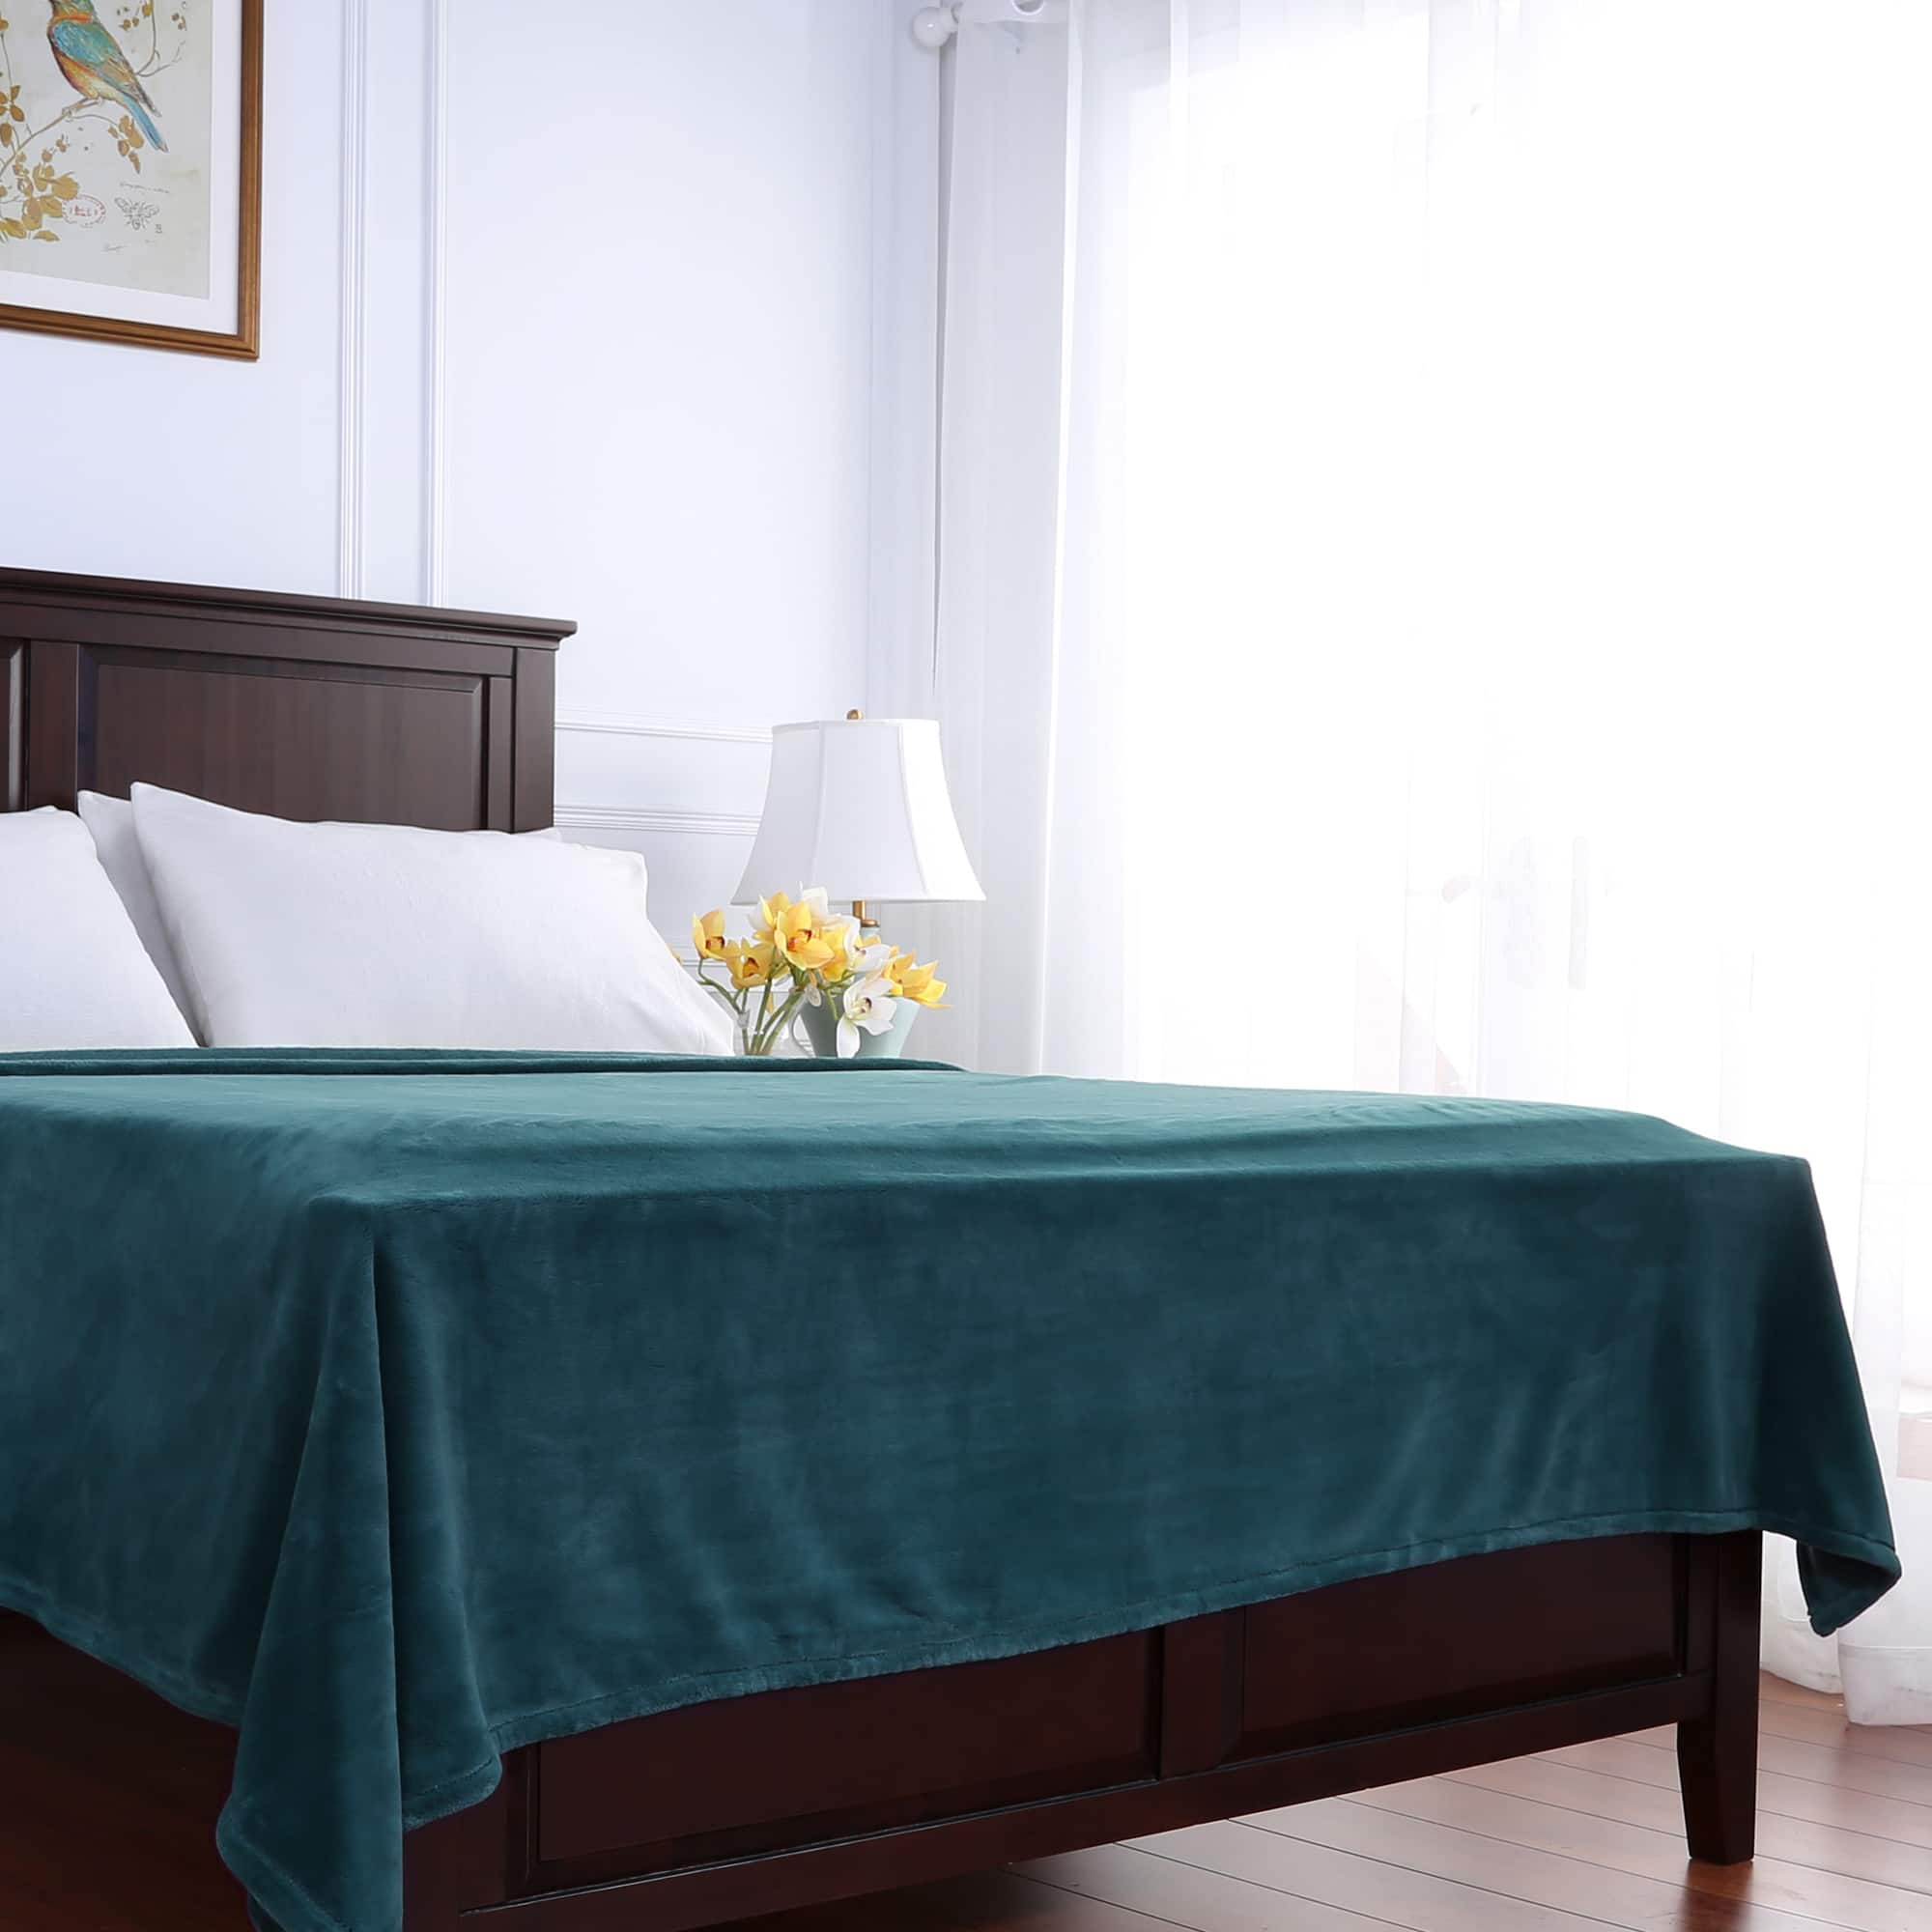 Berkshire Blanket and Home Co Berkshire Blanket PrimaLush Solid Color Bed Blanket by Overstock